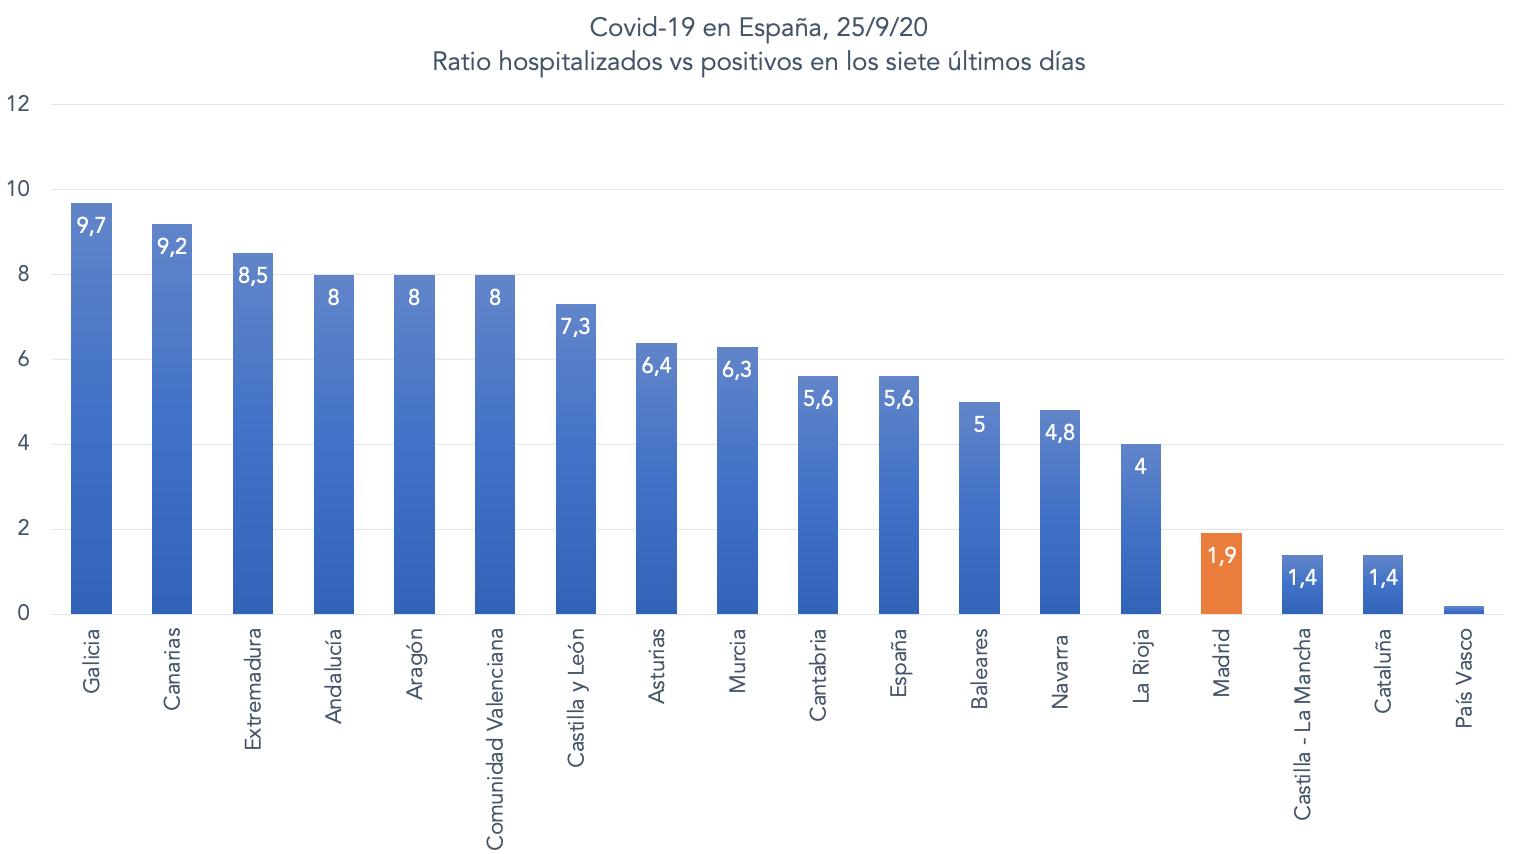 2-positivos-vs-hospitalizados-madrid-covid-19.png